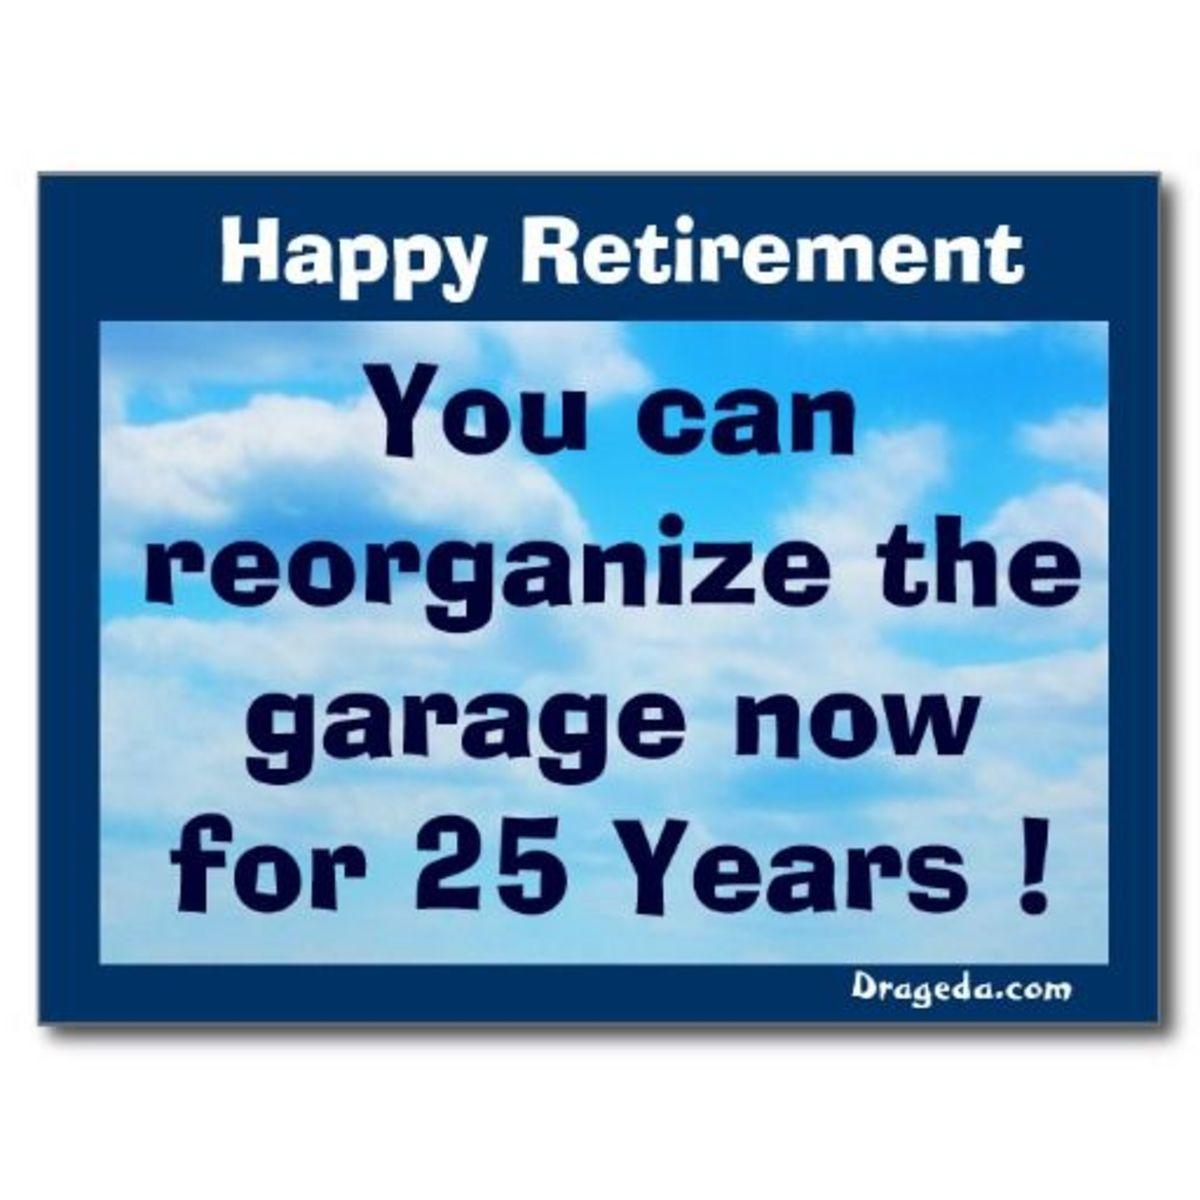 72 retirement sayings for